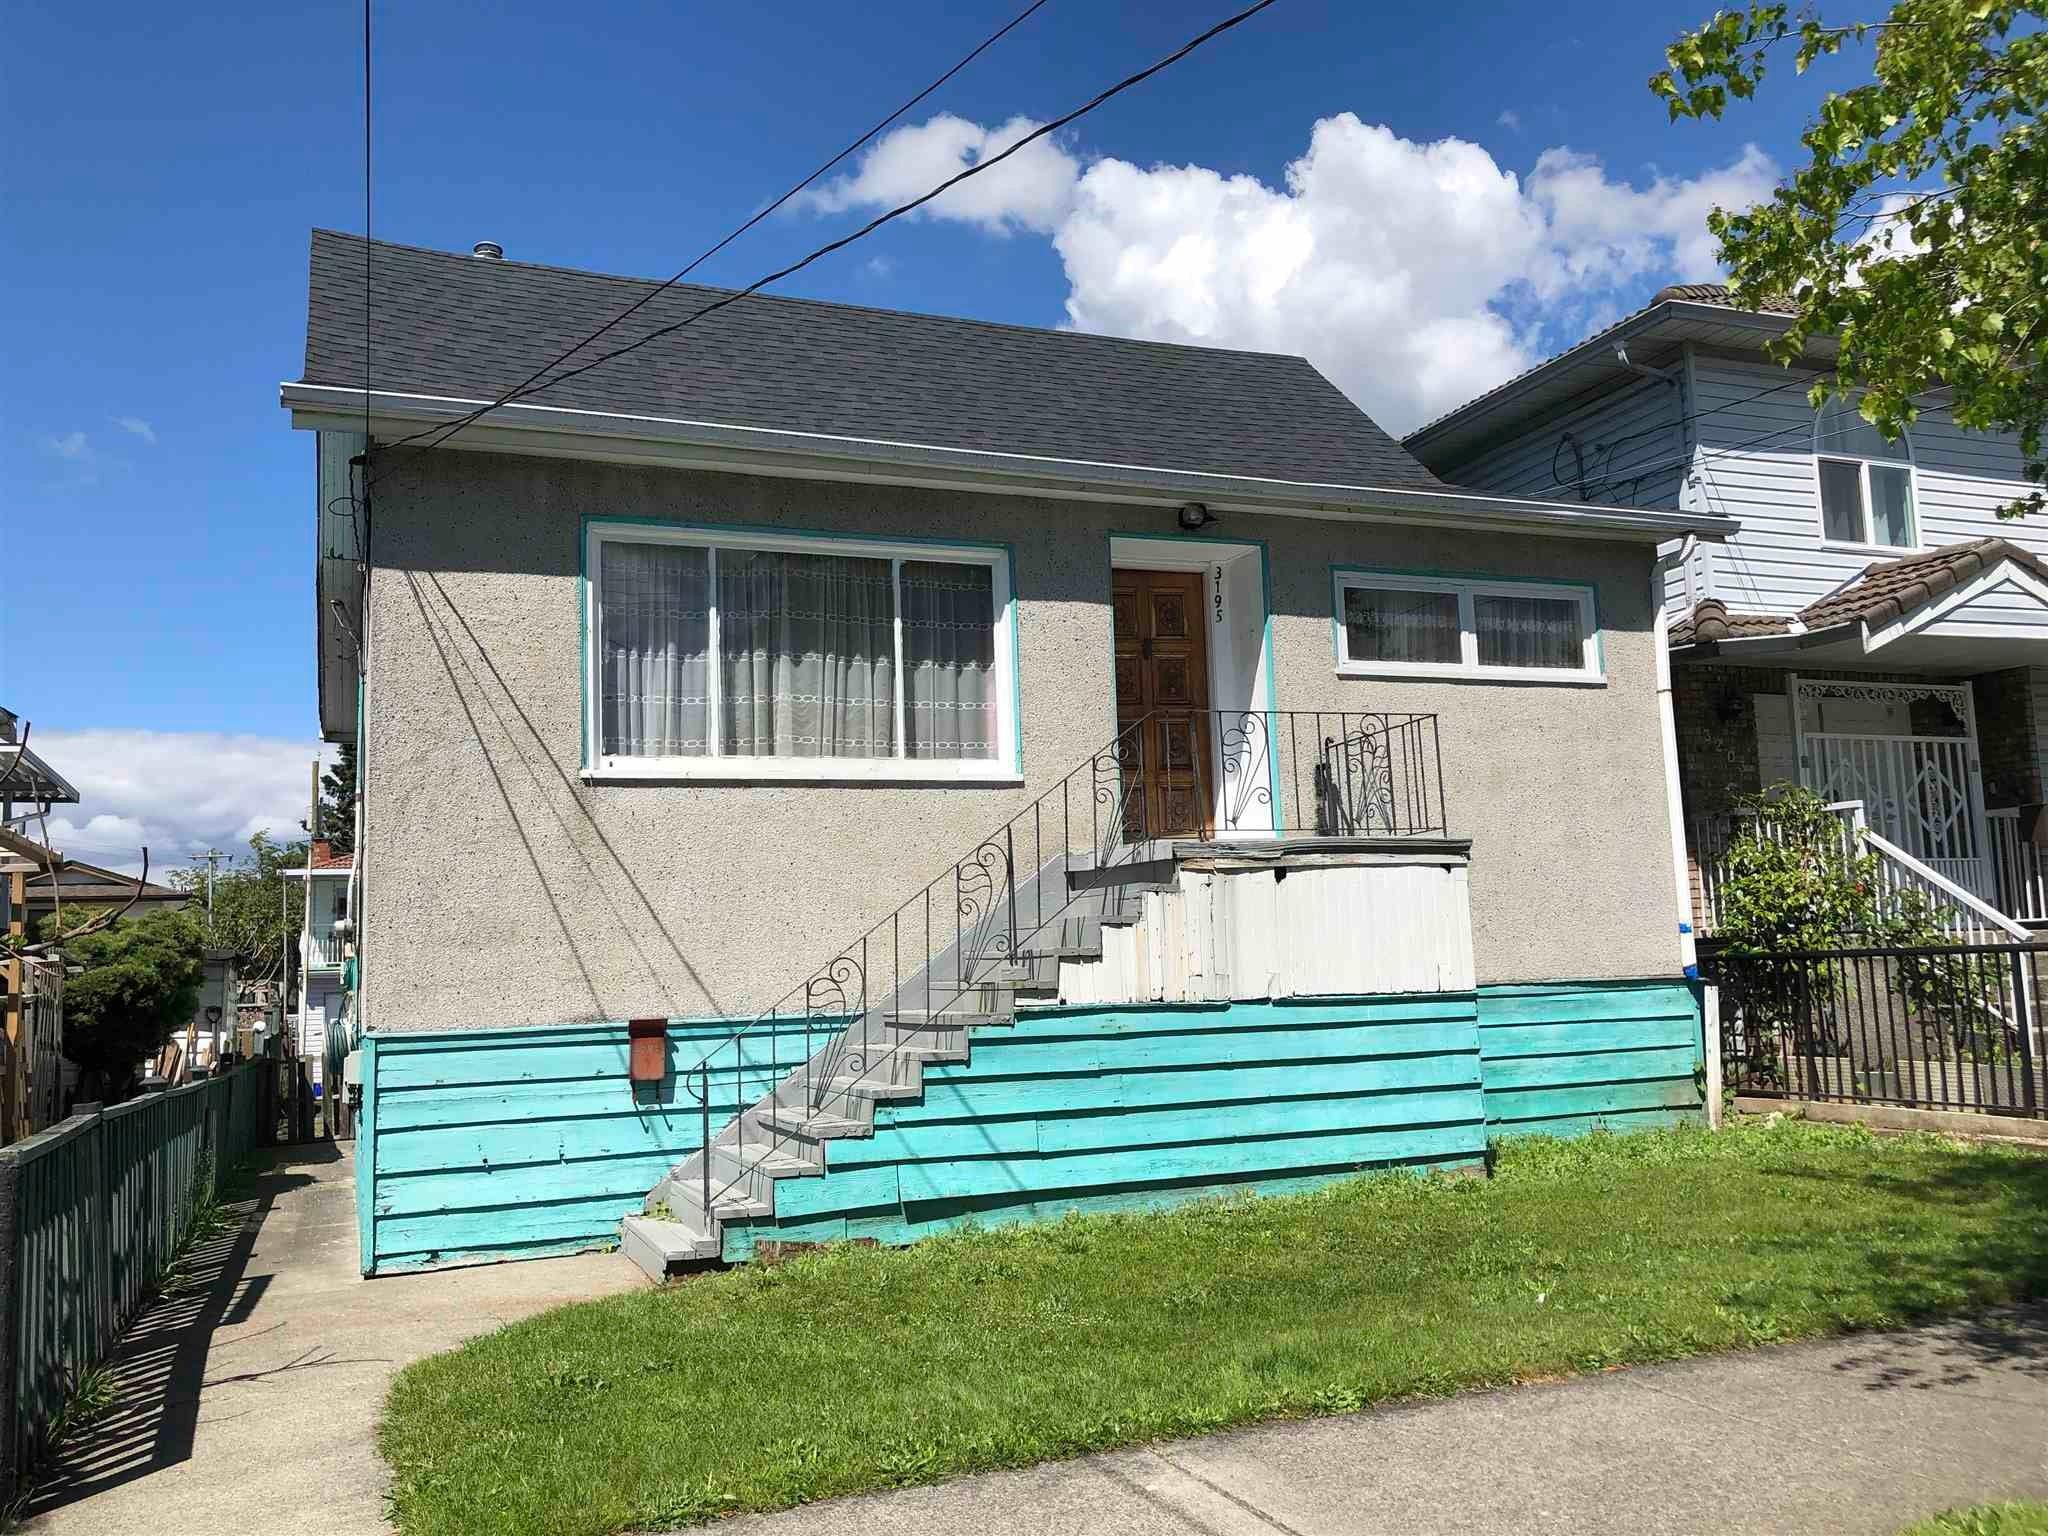 3195 E 47TH AVENUE - Killarney VE House/Single Family for sale, 5 Bedrooms (R2604738) - #1